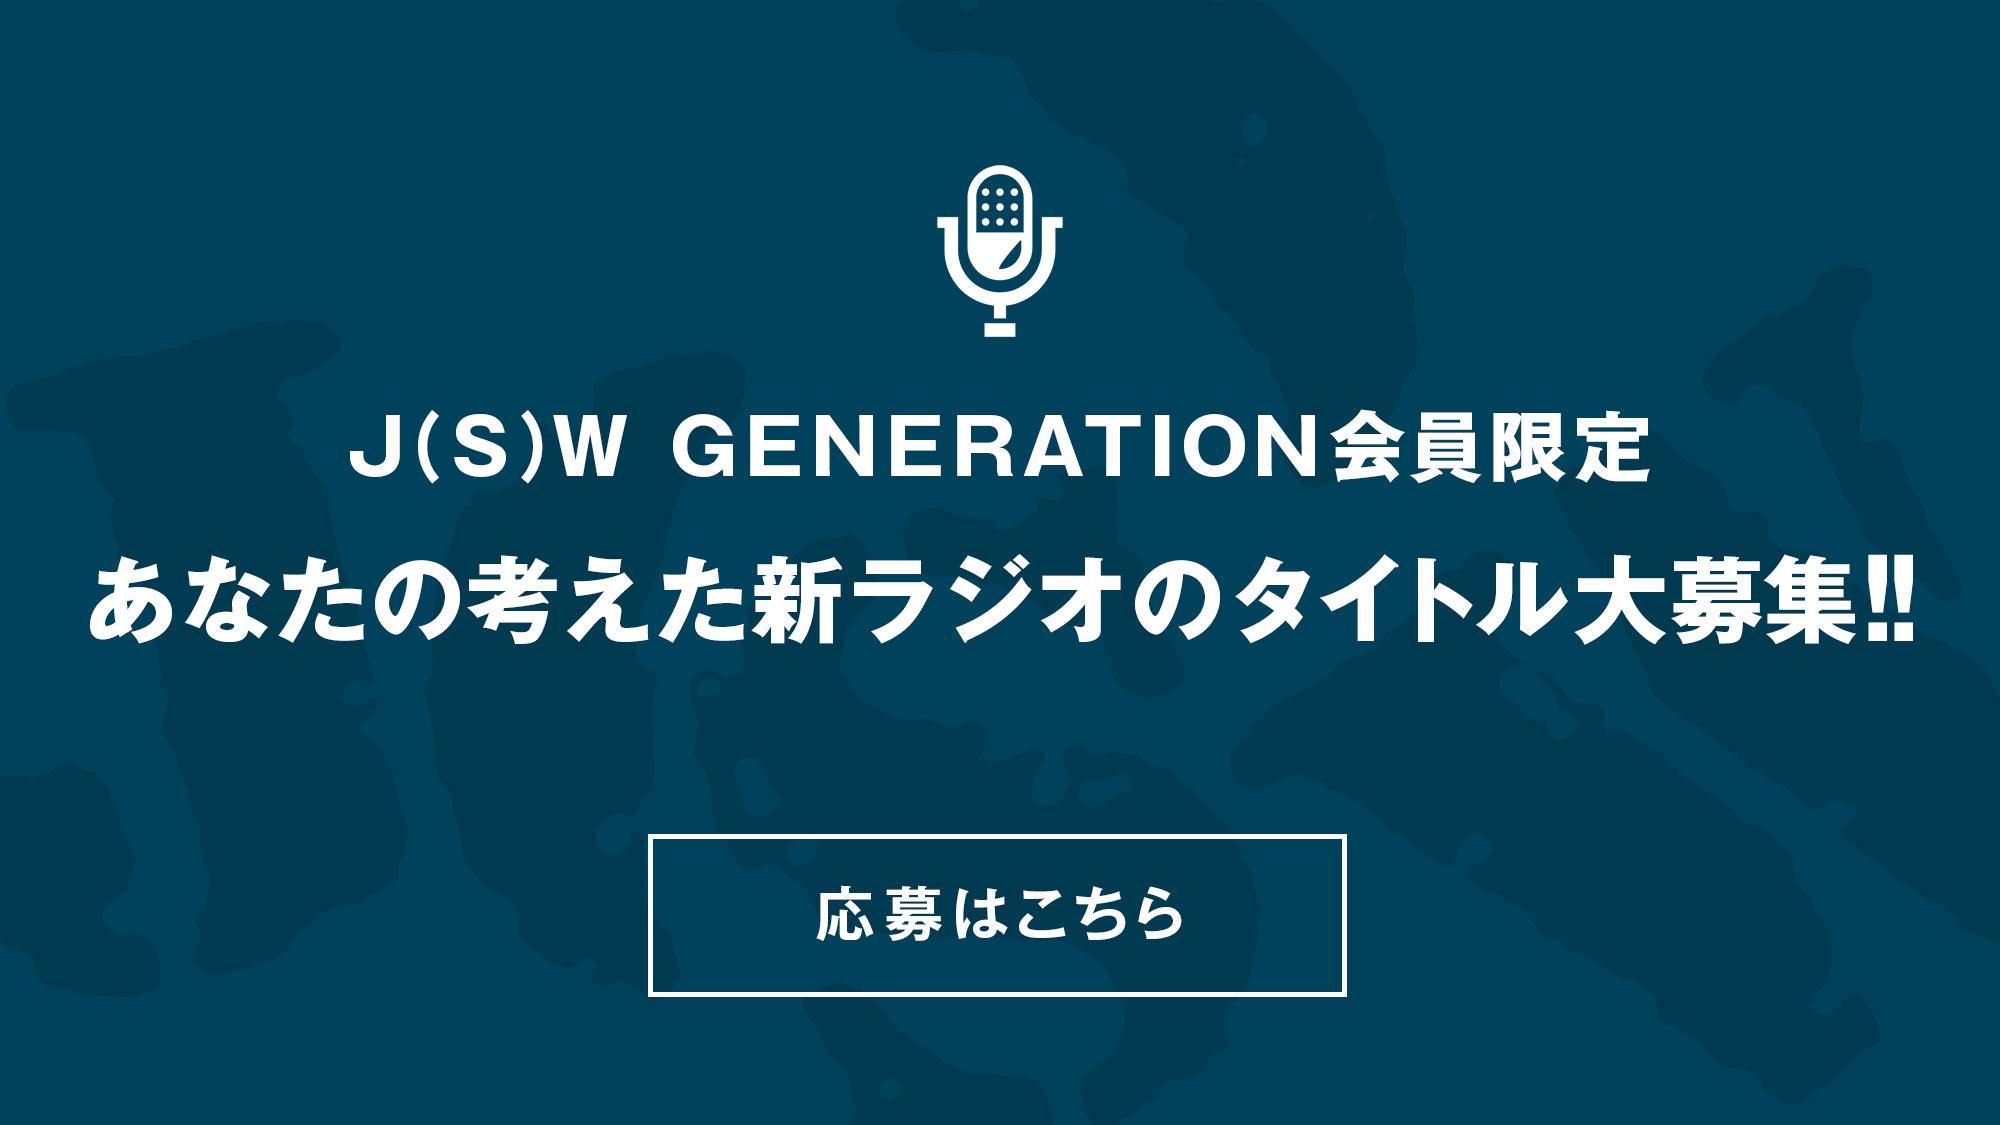 J(S)W GENERATION会員限定 あなたの考えた新ラジオのタイトル大募集